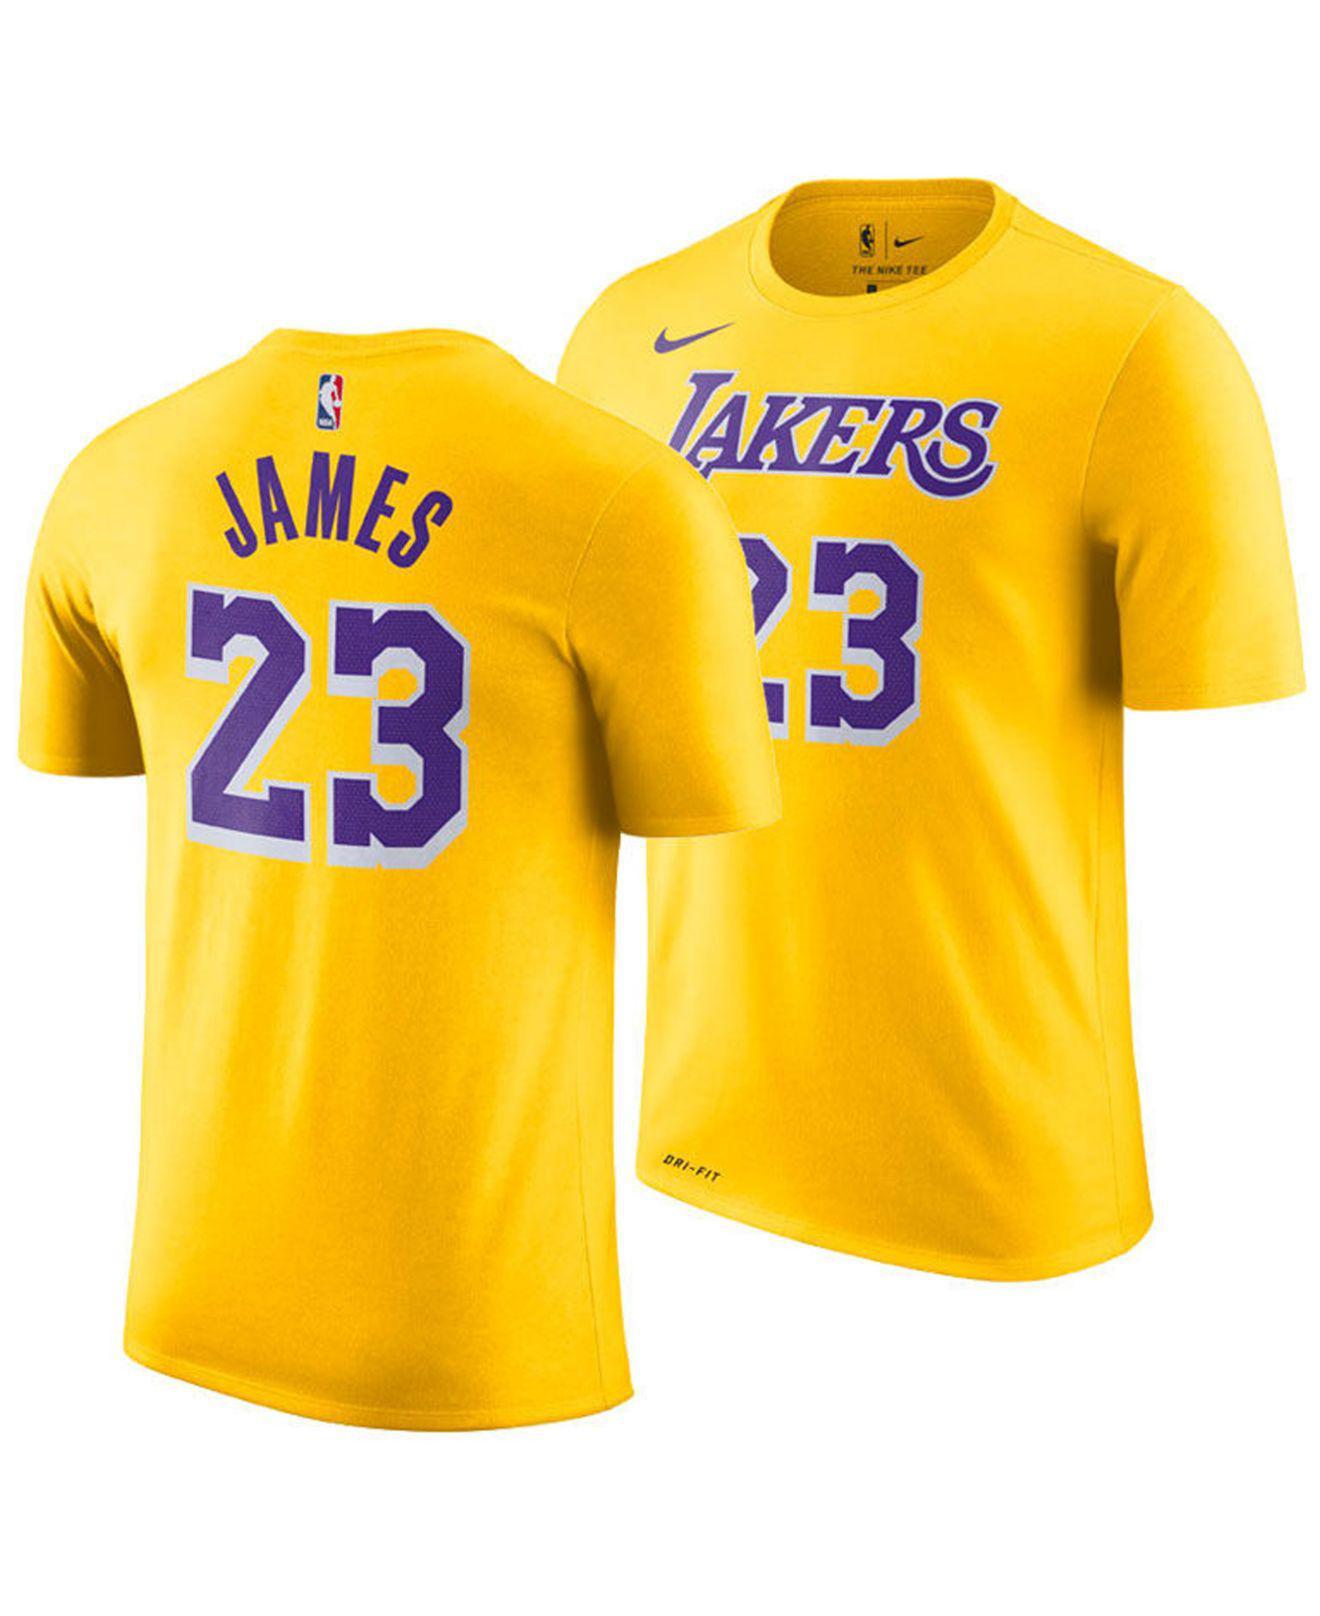 e6fc3cff Nike. Men's Yellow Lebron James Los Angeles Lakers Icon Player T-shirt